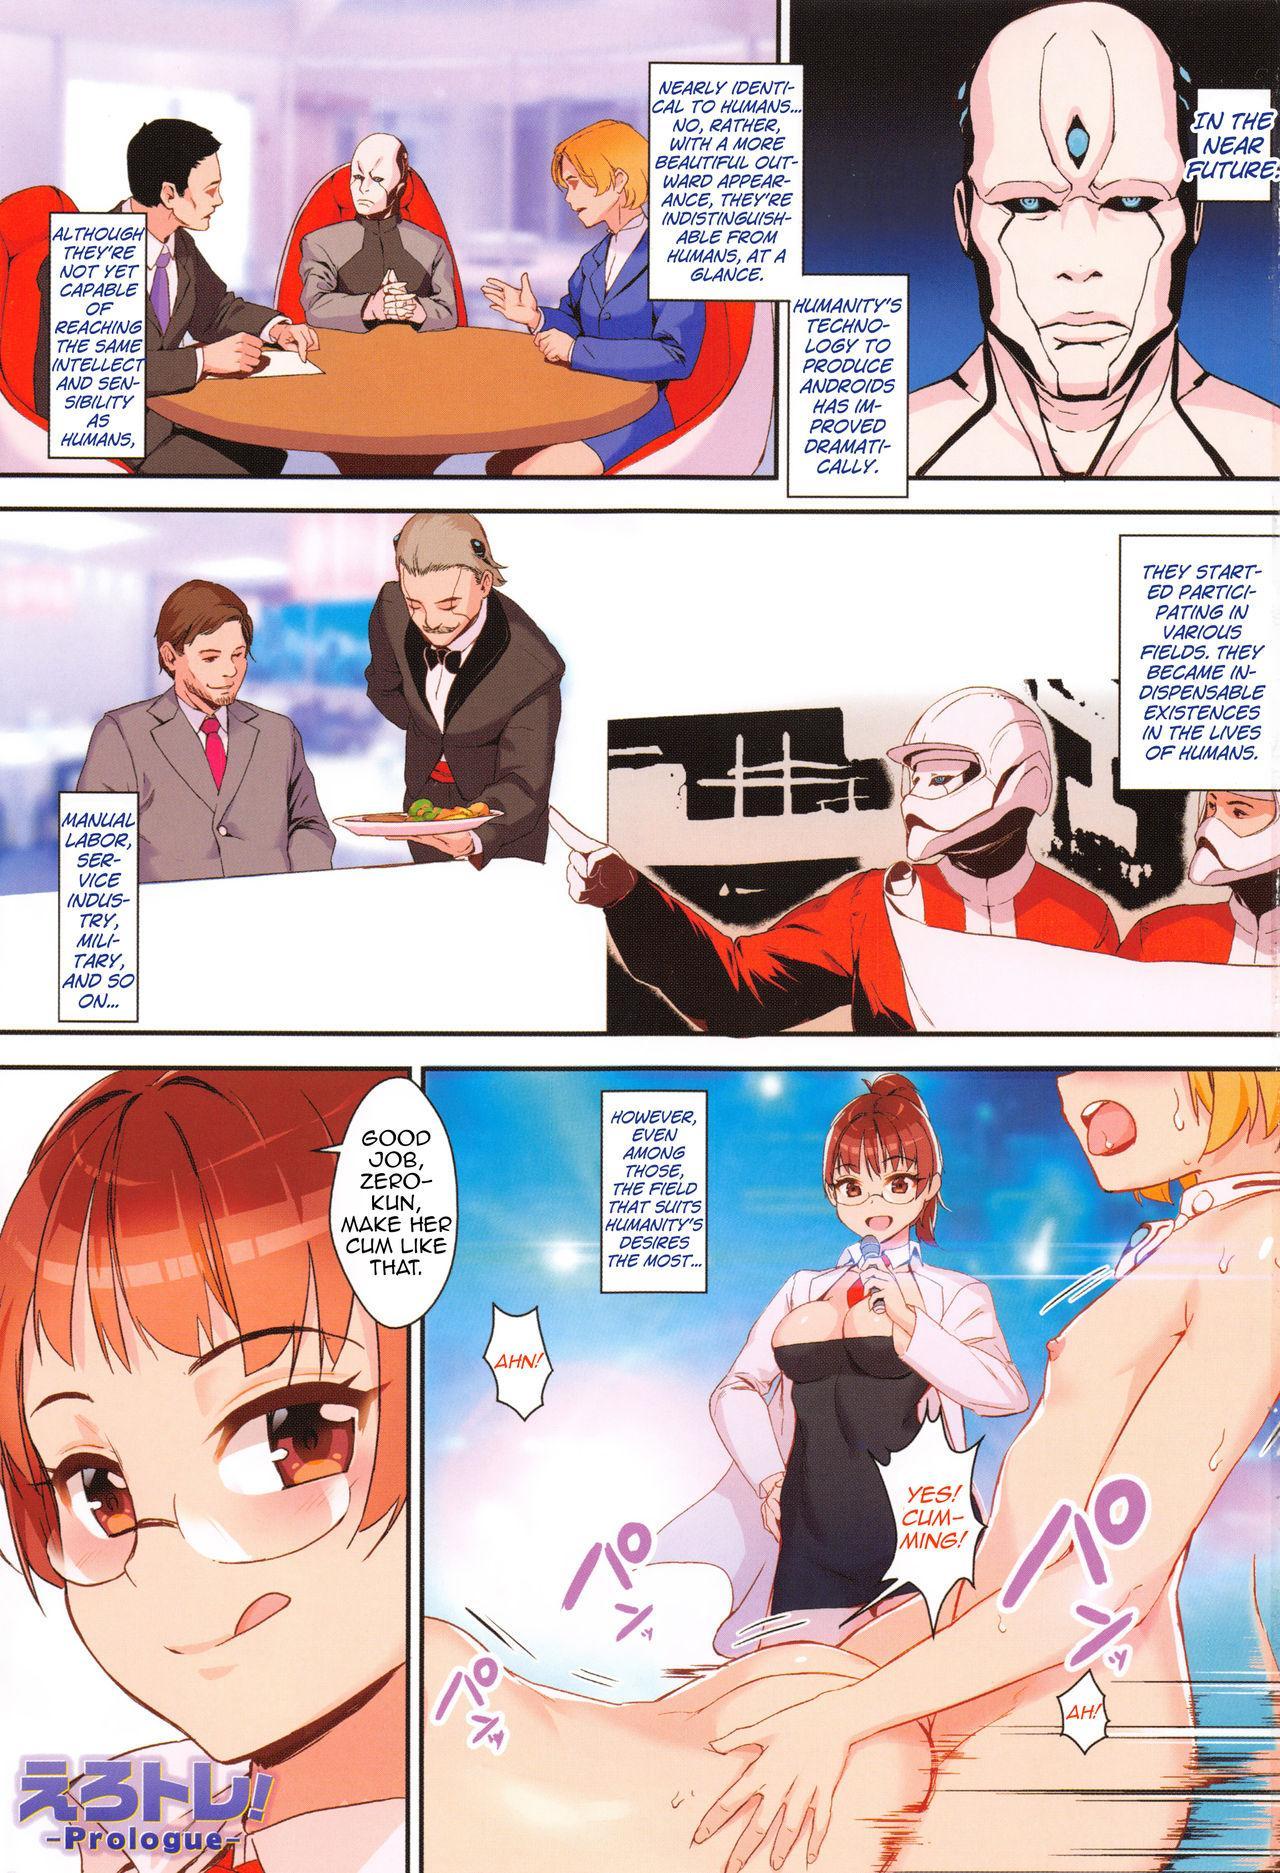 [Jairou] Erotic Training! ~Pakopako Rankou Seikyouiku~ Ch. 1-2 [English] [MrBubbles] 0